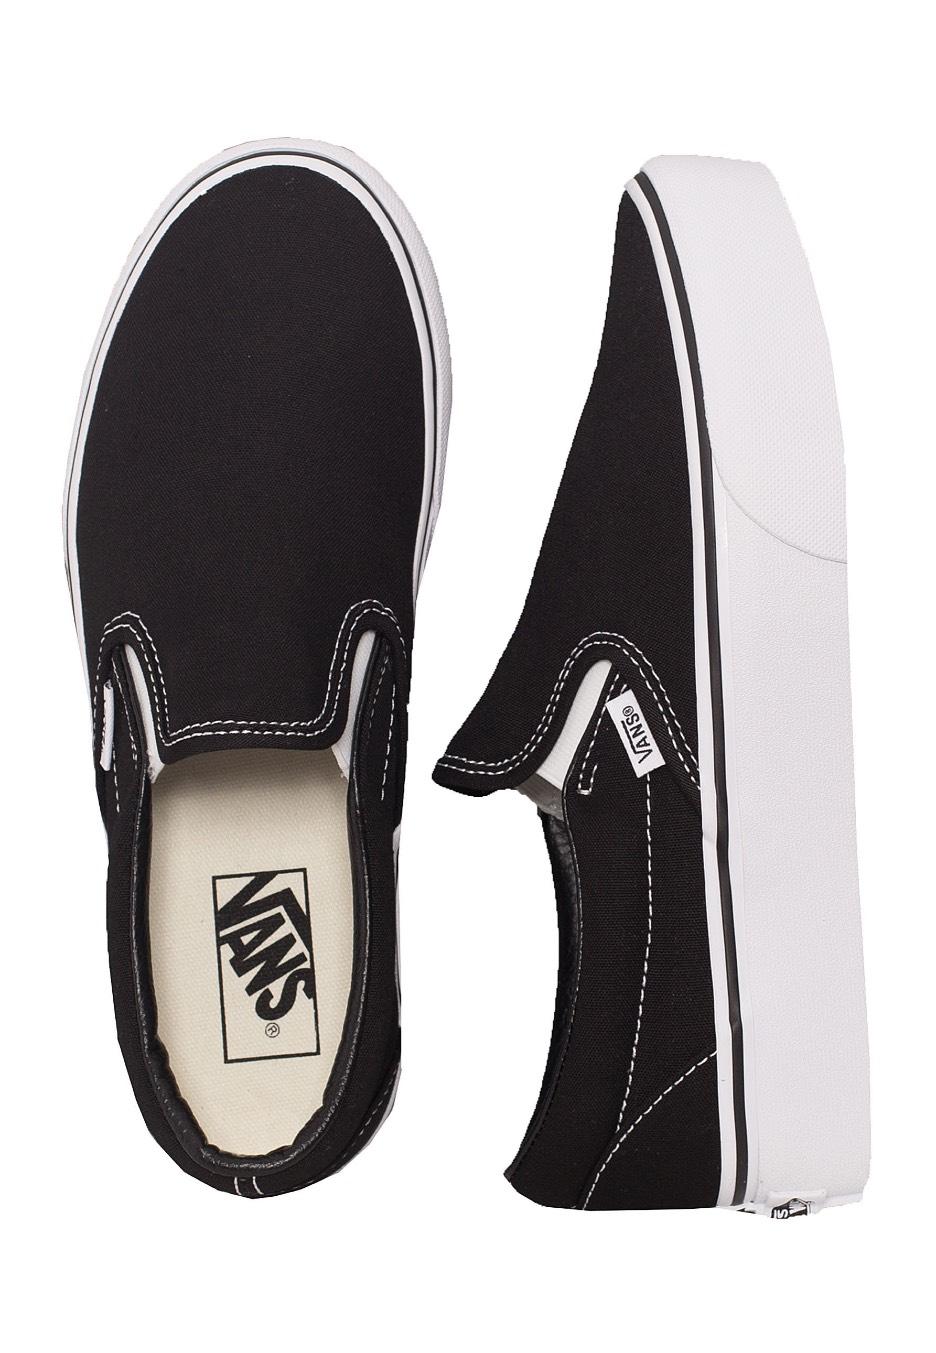 Platform Black - Girl Shoes - Impericon